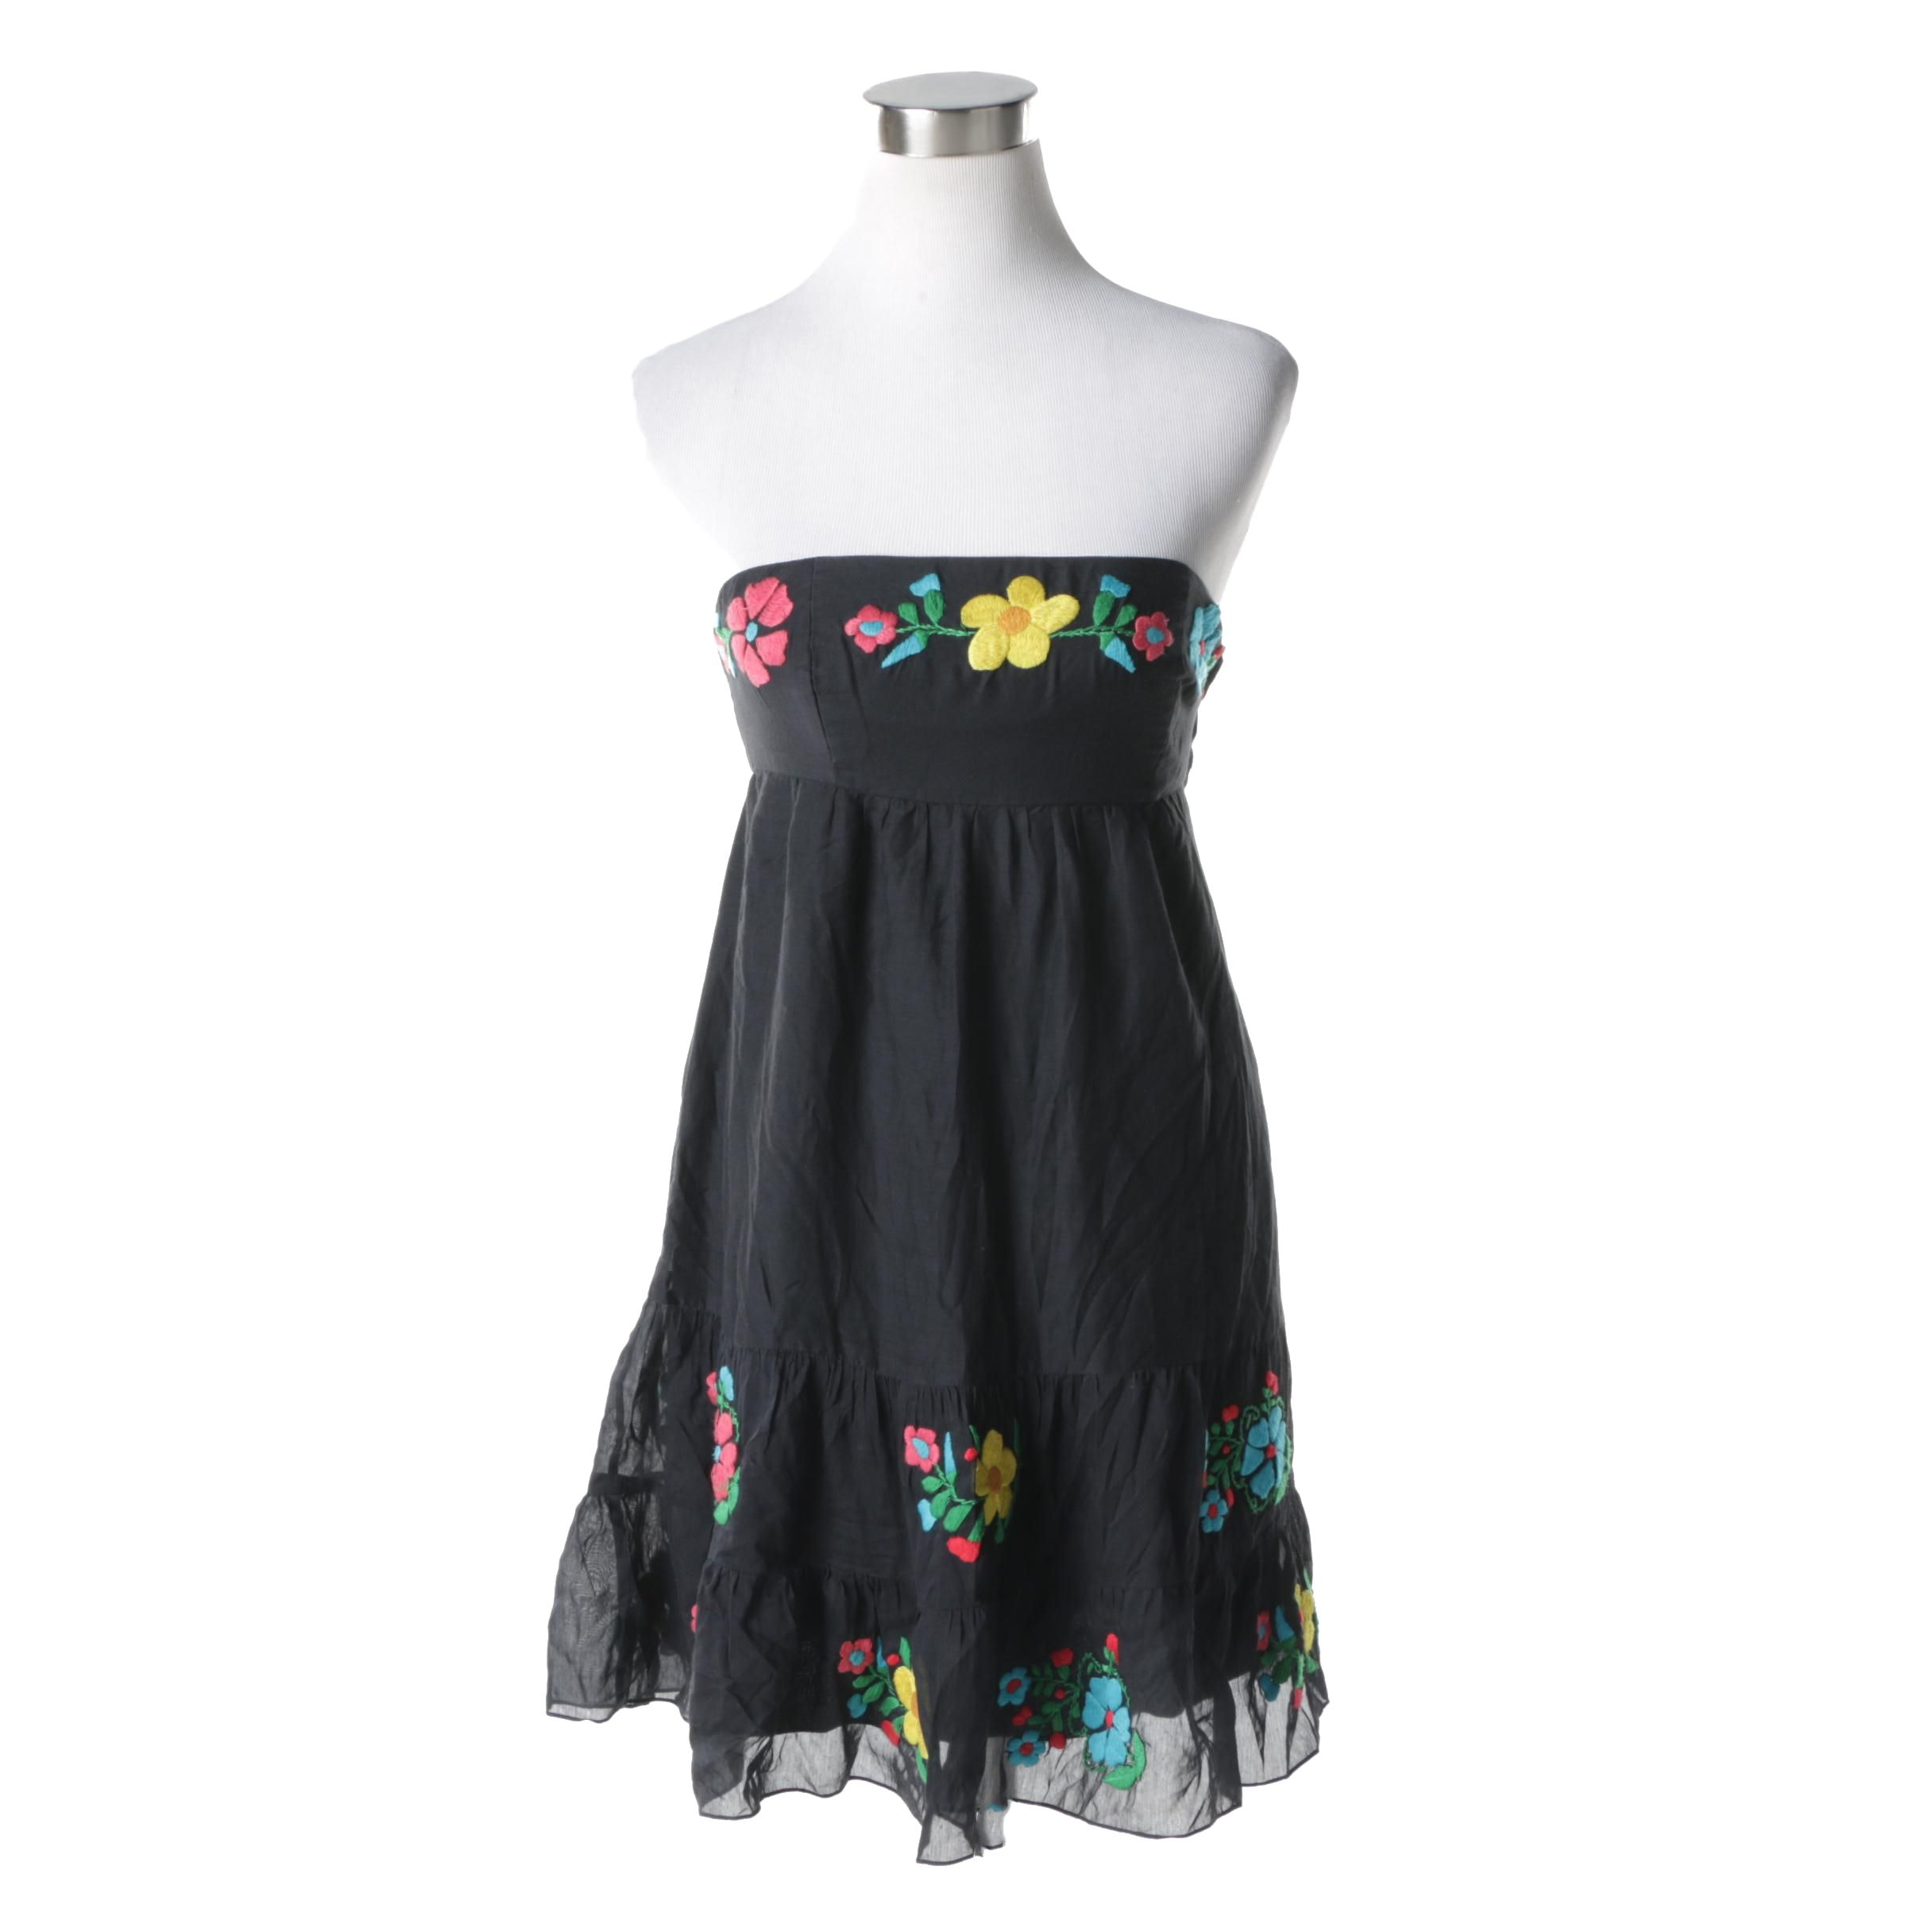 Tibi New York Embroidered Strapless Dress